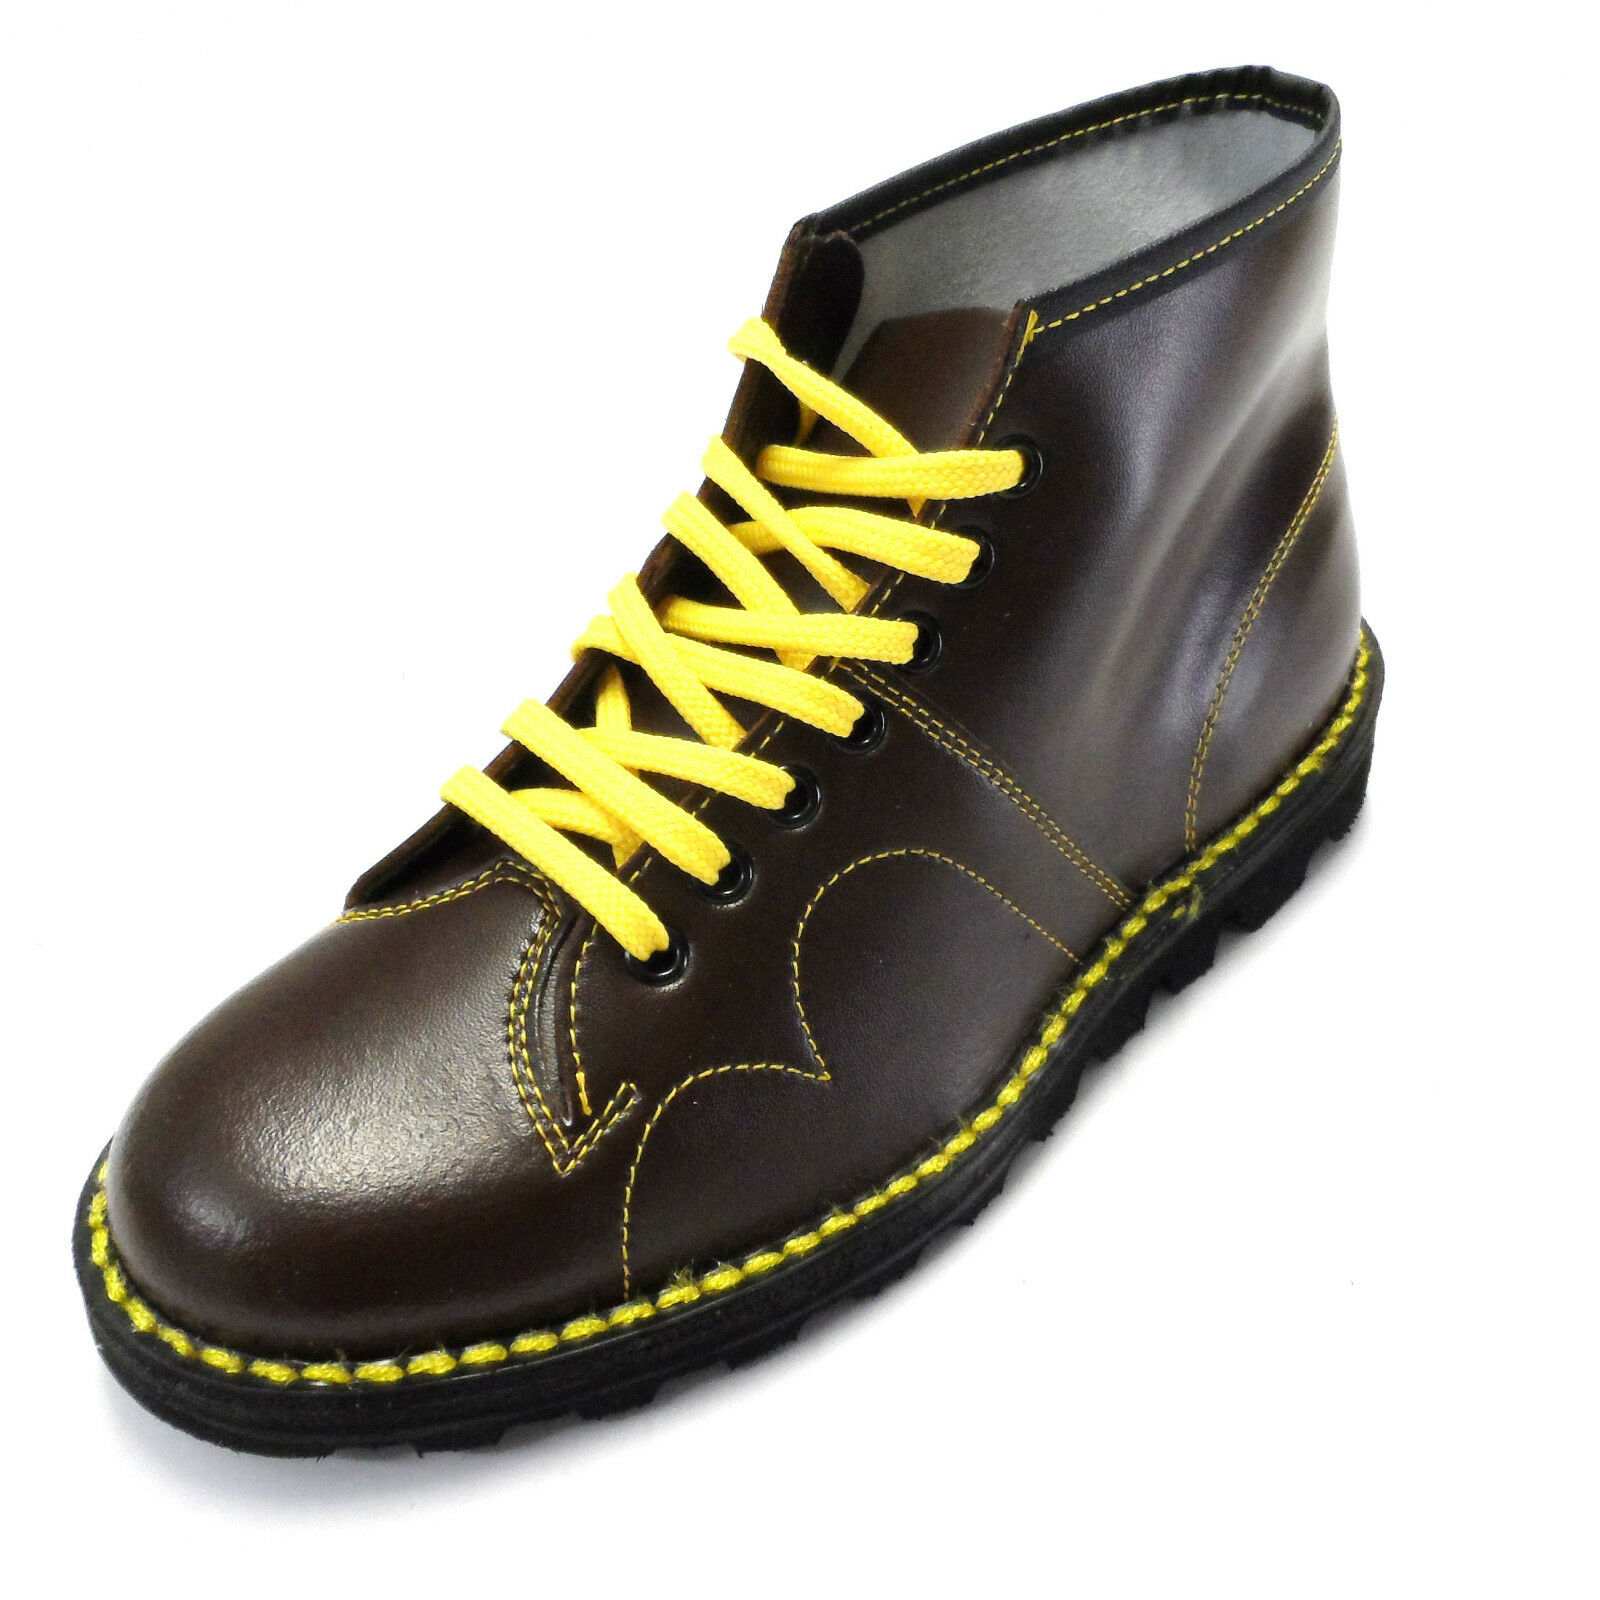 ORIGINAL 1970's Boots Style Oxblood Pelle Monkey Boots 1970's e90082